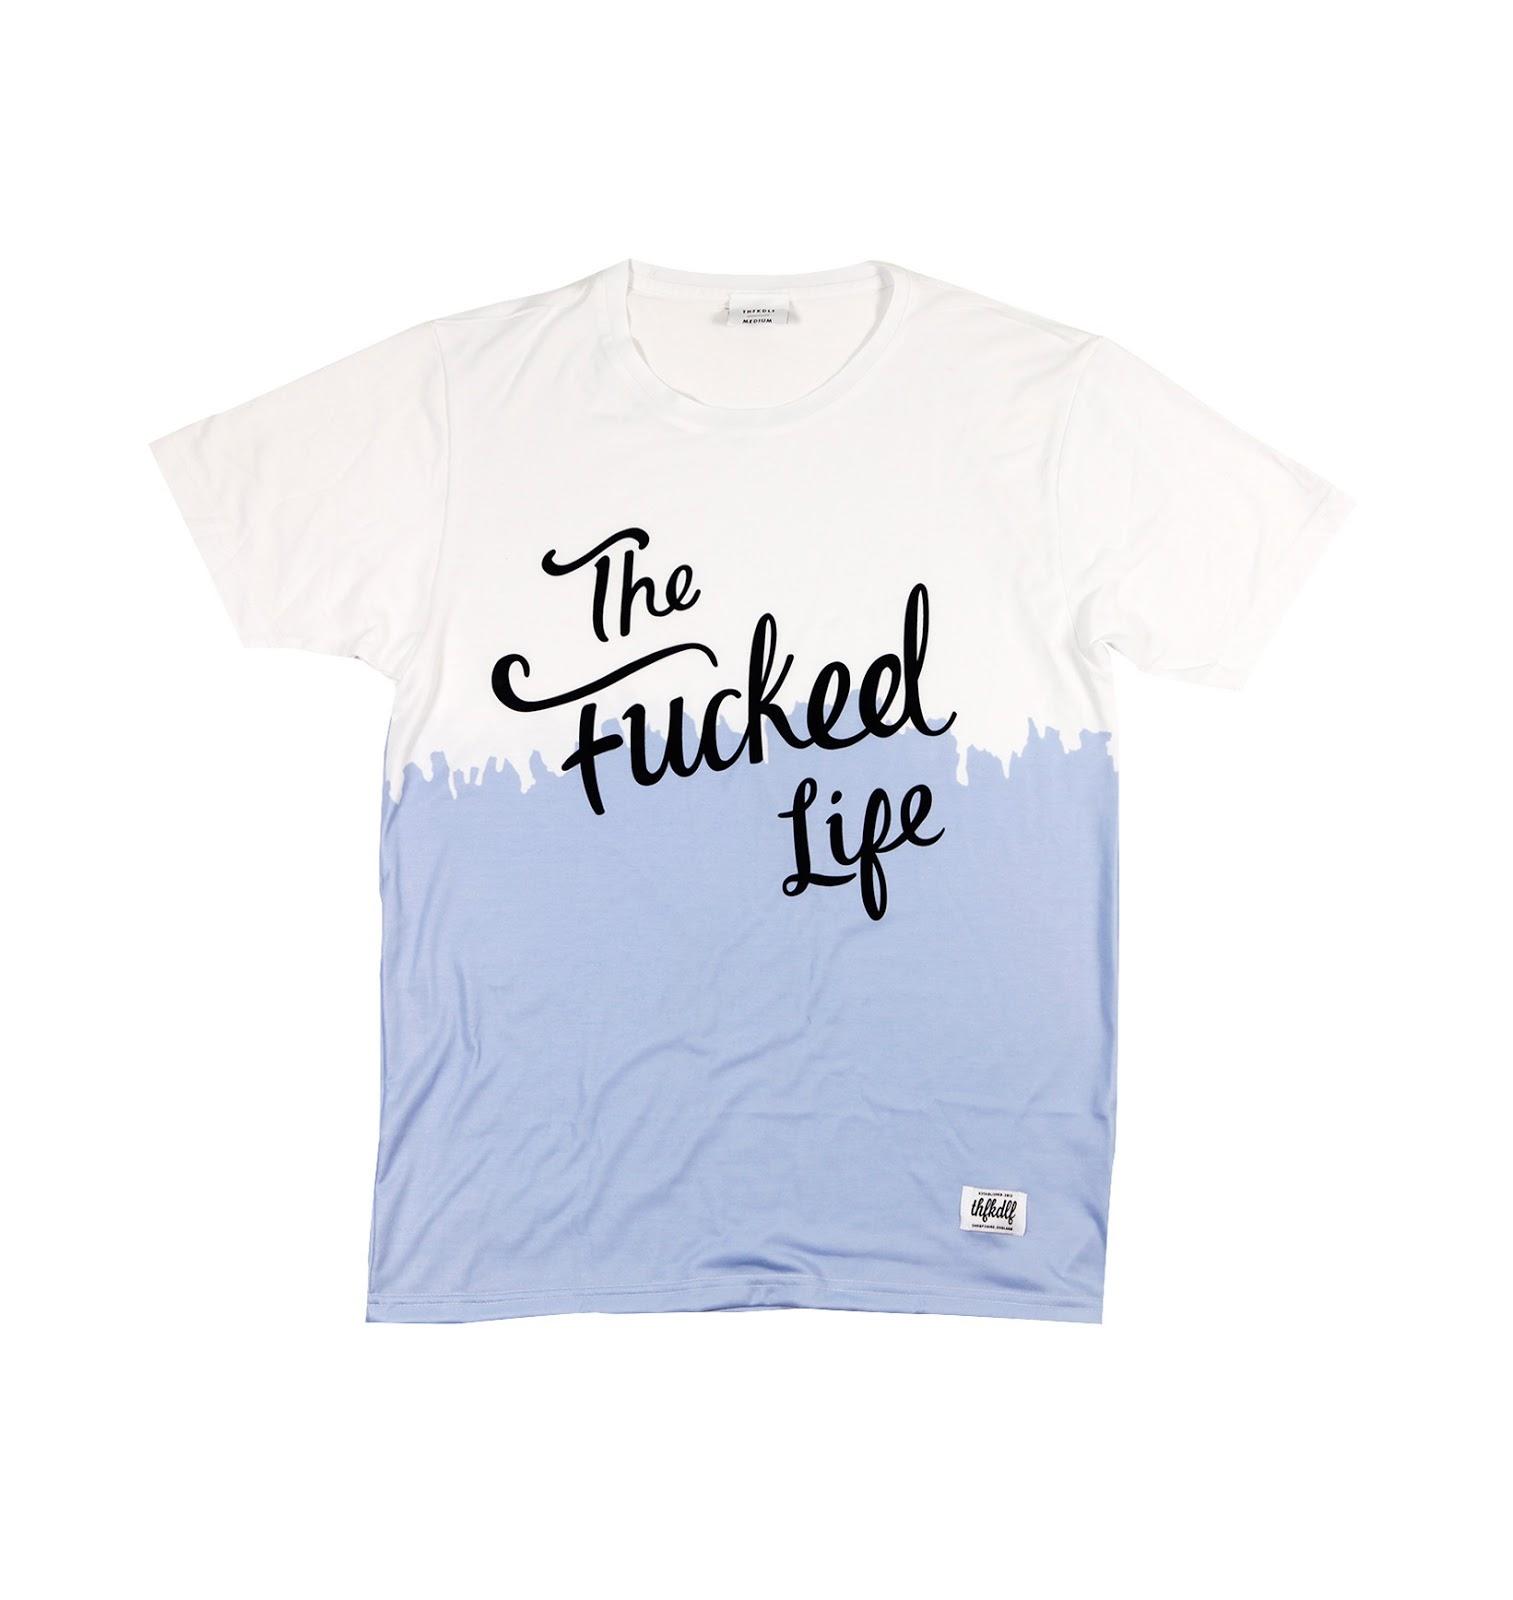 https://grafitee.es/s/camisetas/904-t-shirt-the-fucked-life-dip-dye.html